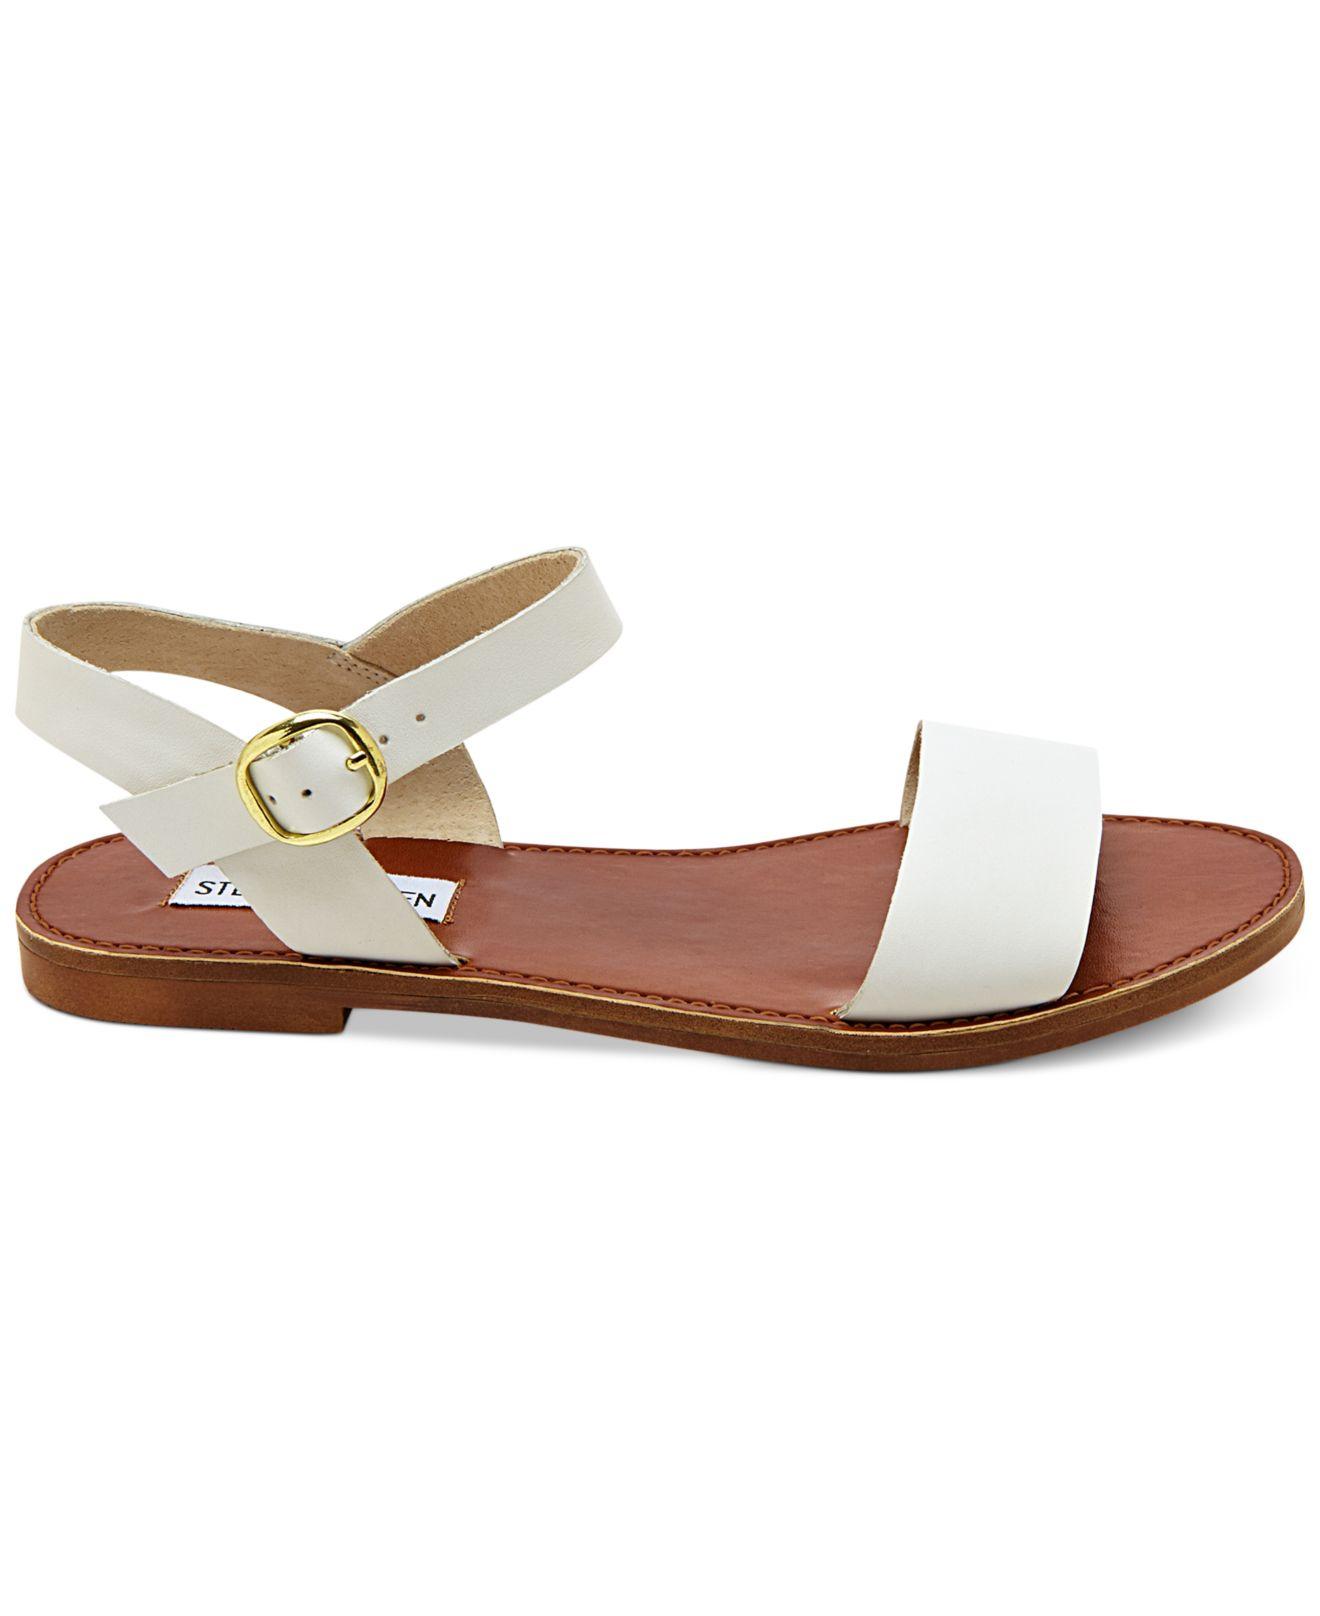 steve madden donddi flat sandals in white lyst. Black Bedroom Furniture Sets. Home Design Ideas